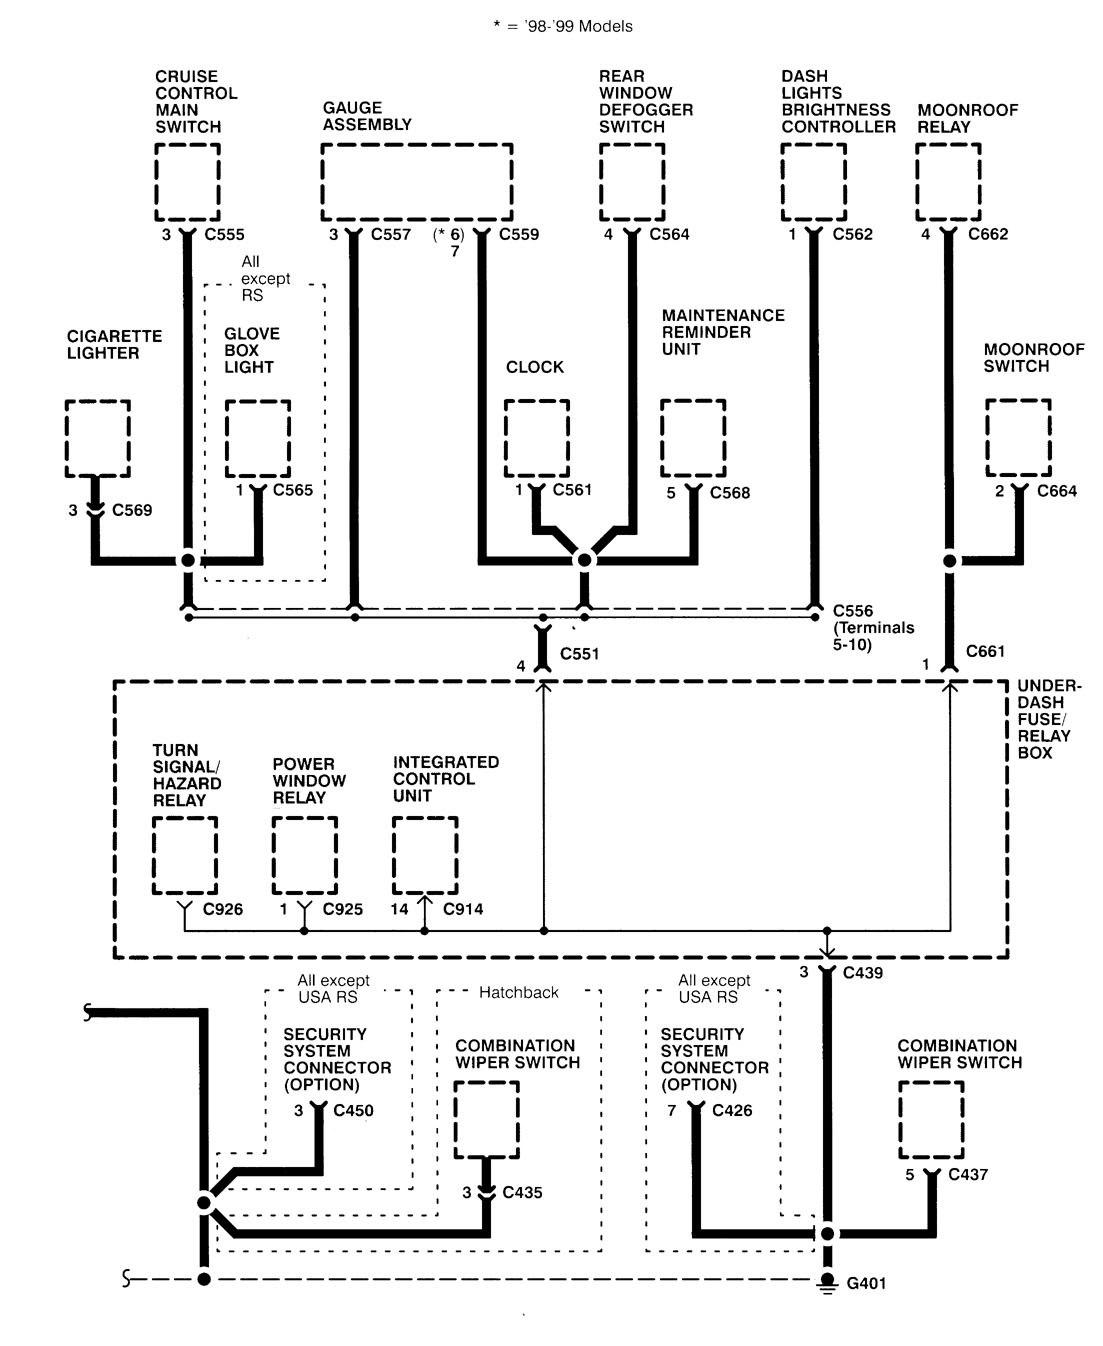 Acura Integra 1998 2001 Wiring Diagrams Ground Distribution 98 Diagram Part 6